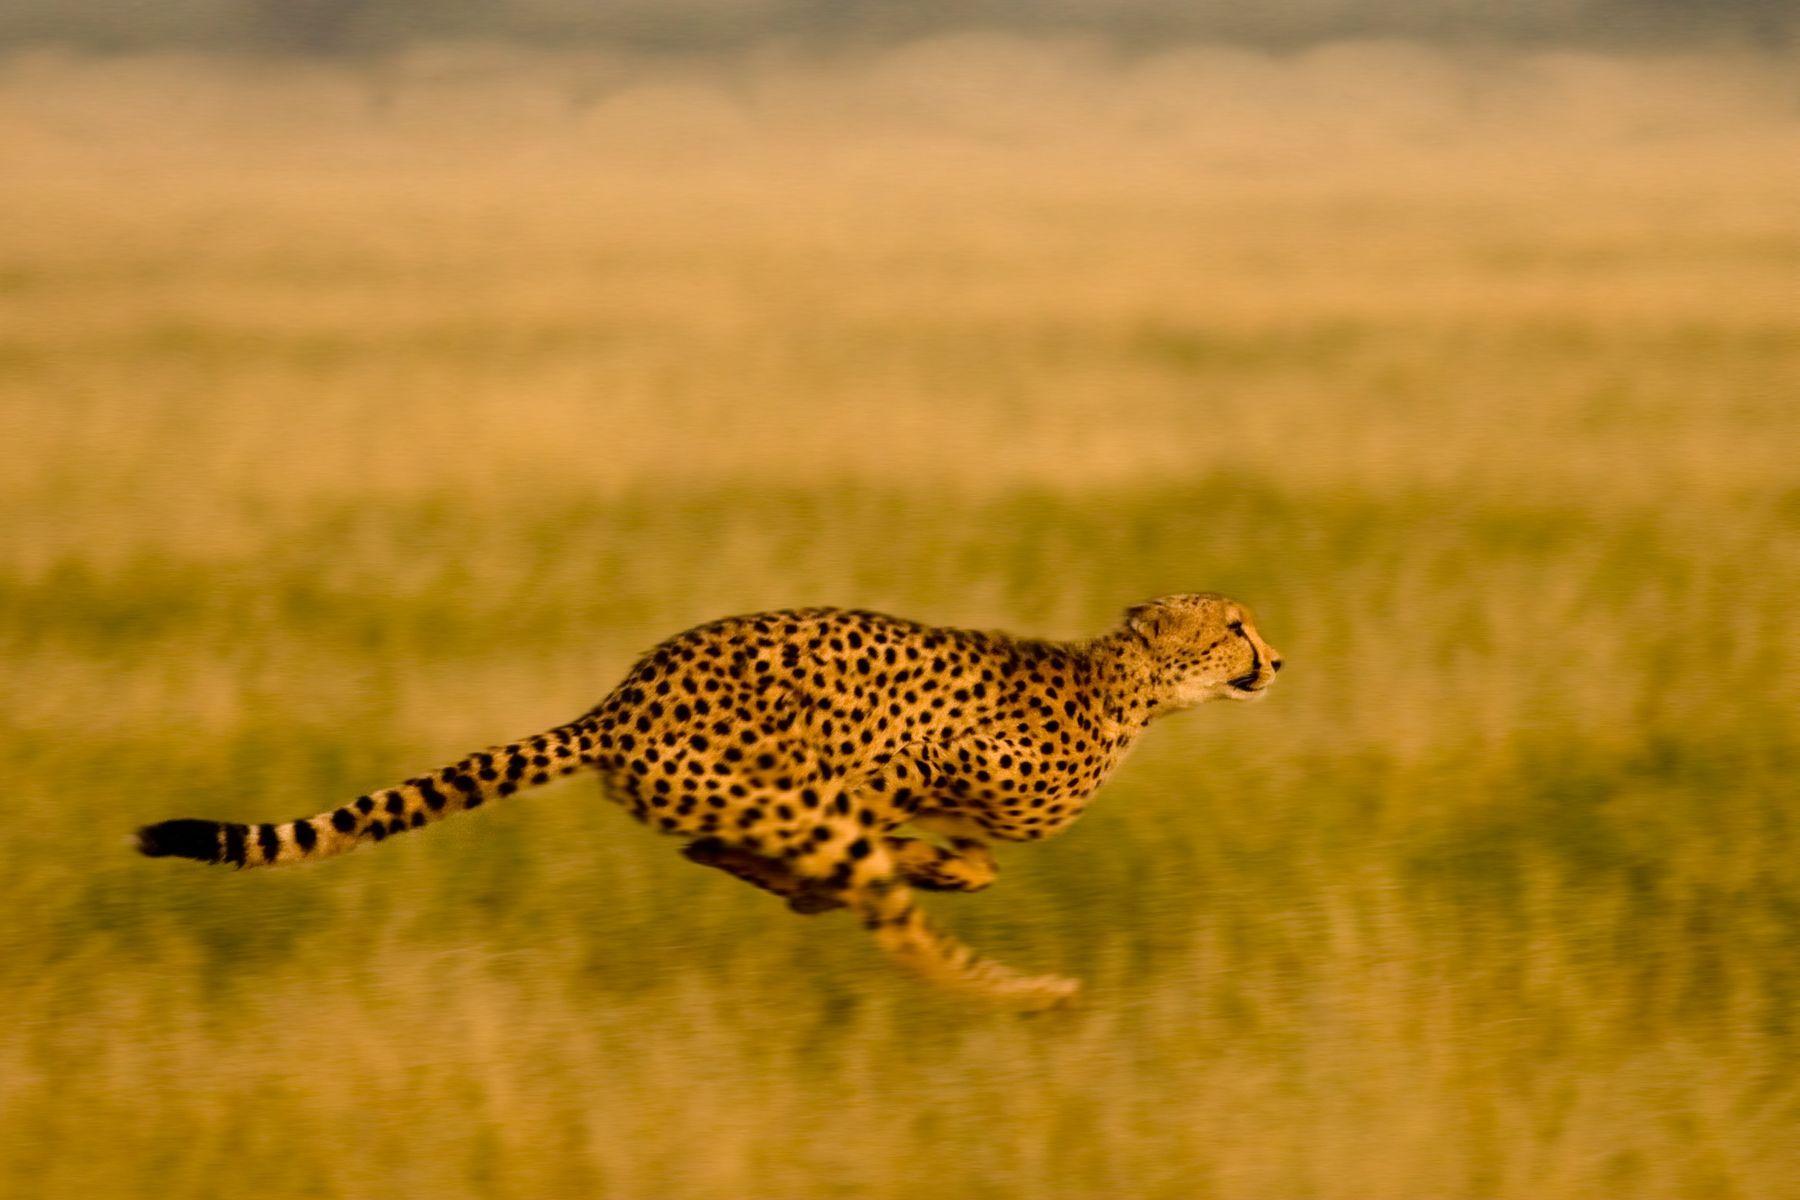 Cheetah motion blur by Grant Reid